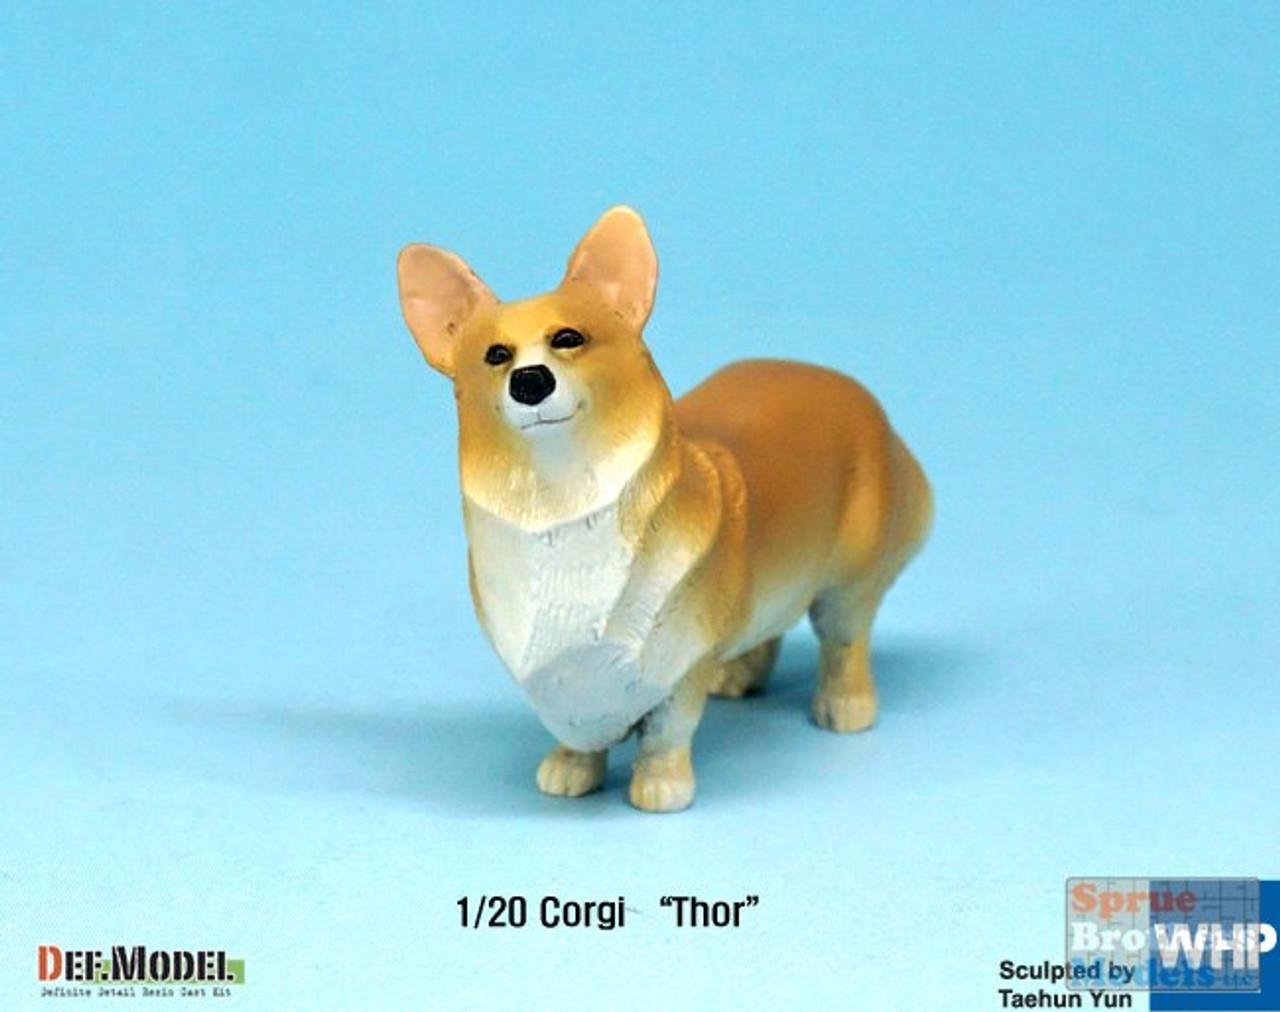 DEFDF20002 1:20 DEF Model Figure Set - Corgi 'Thor'